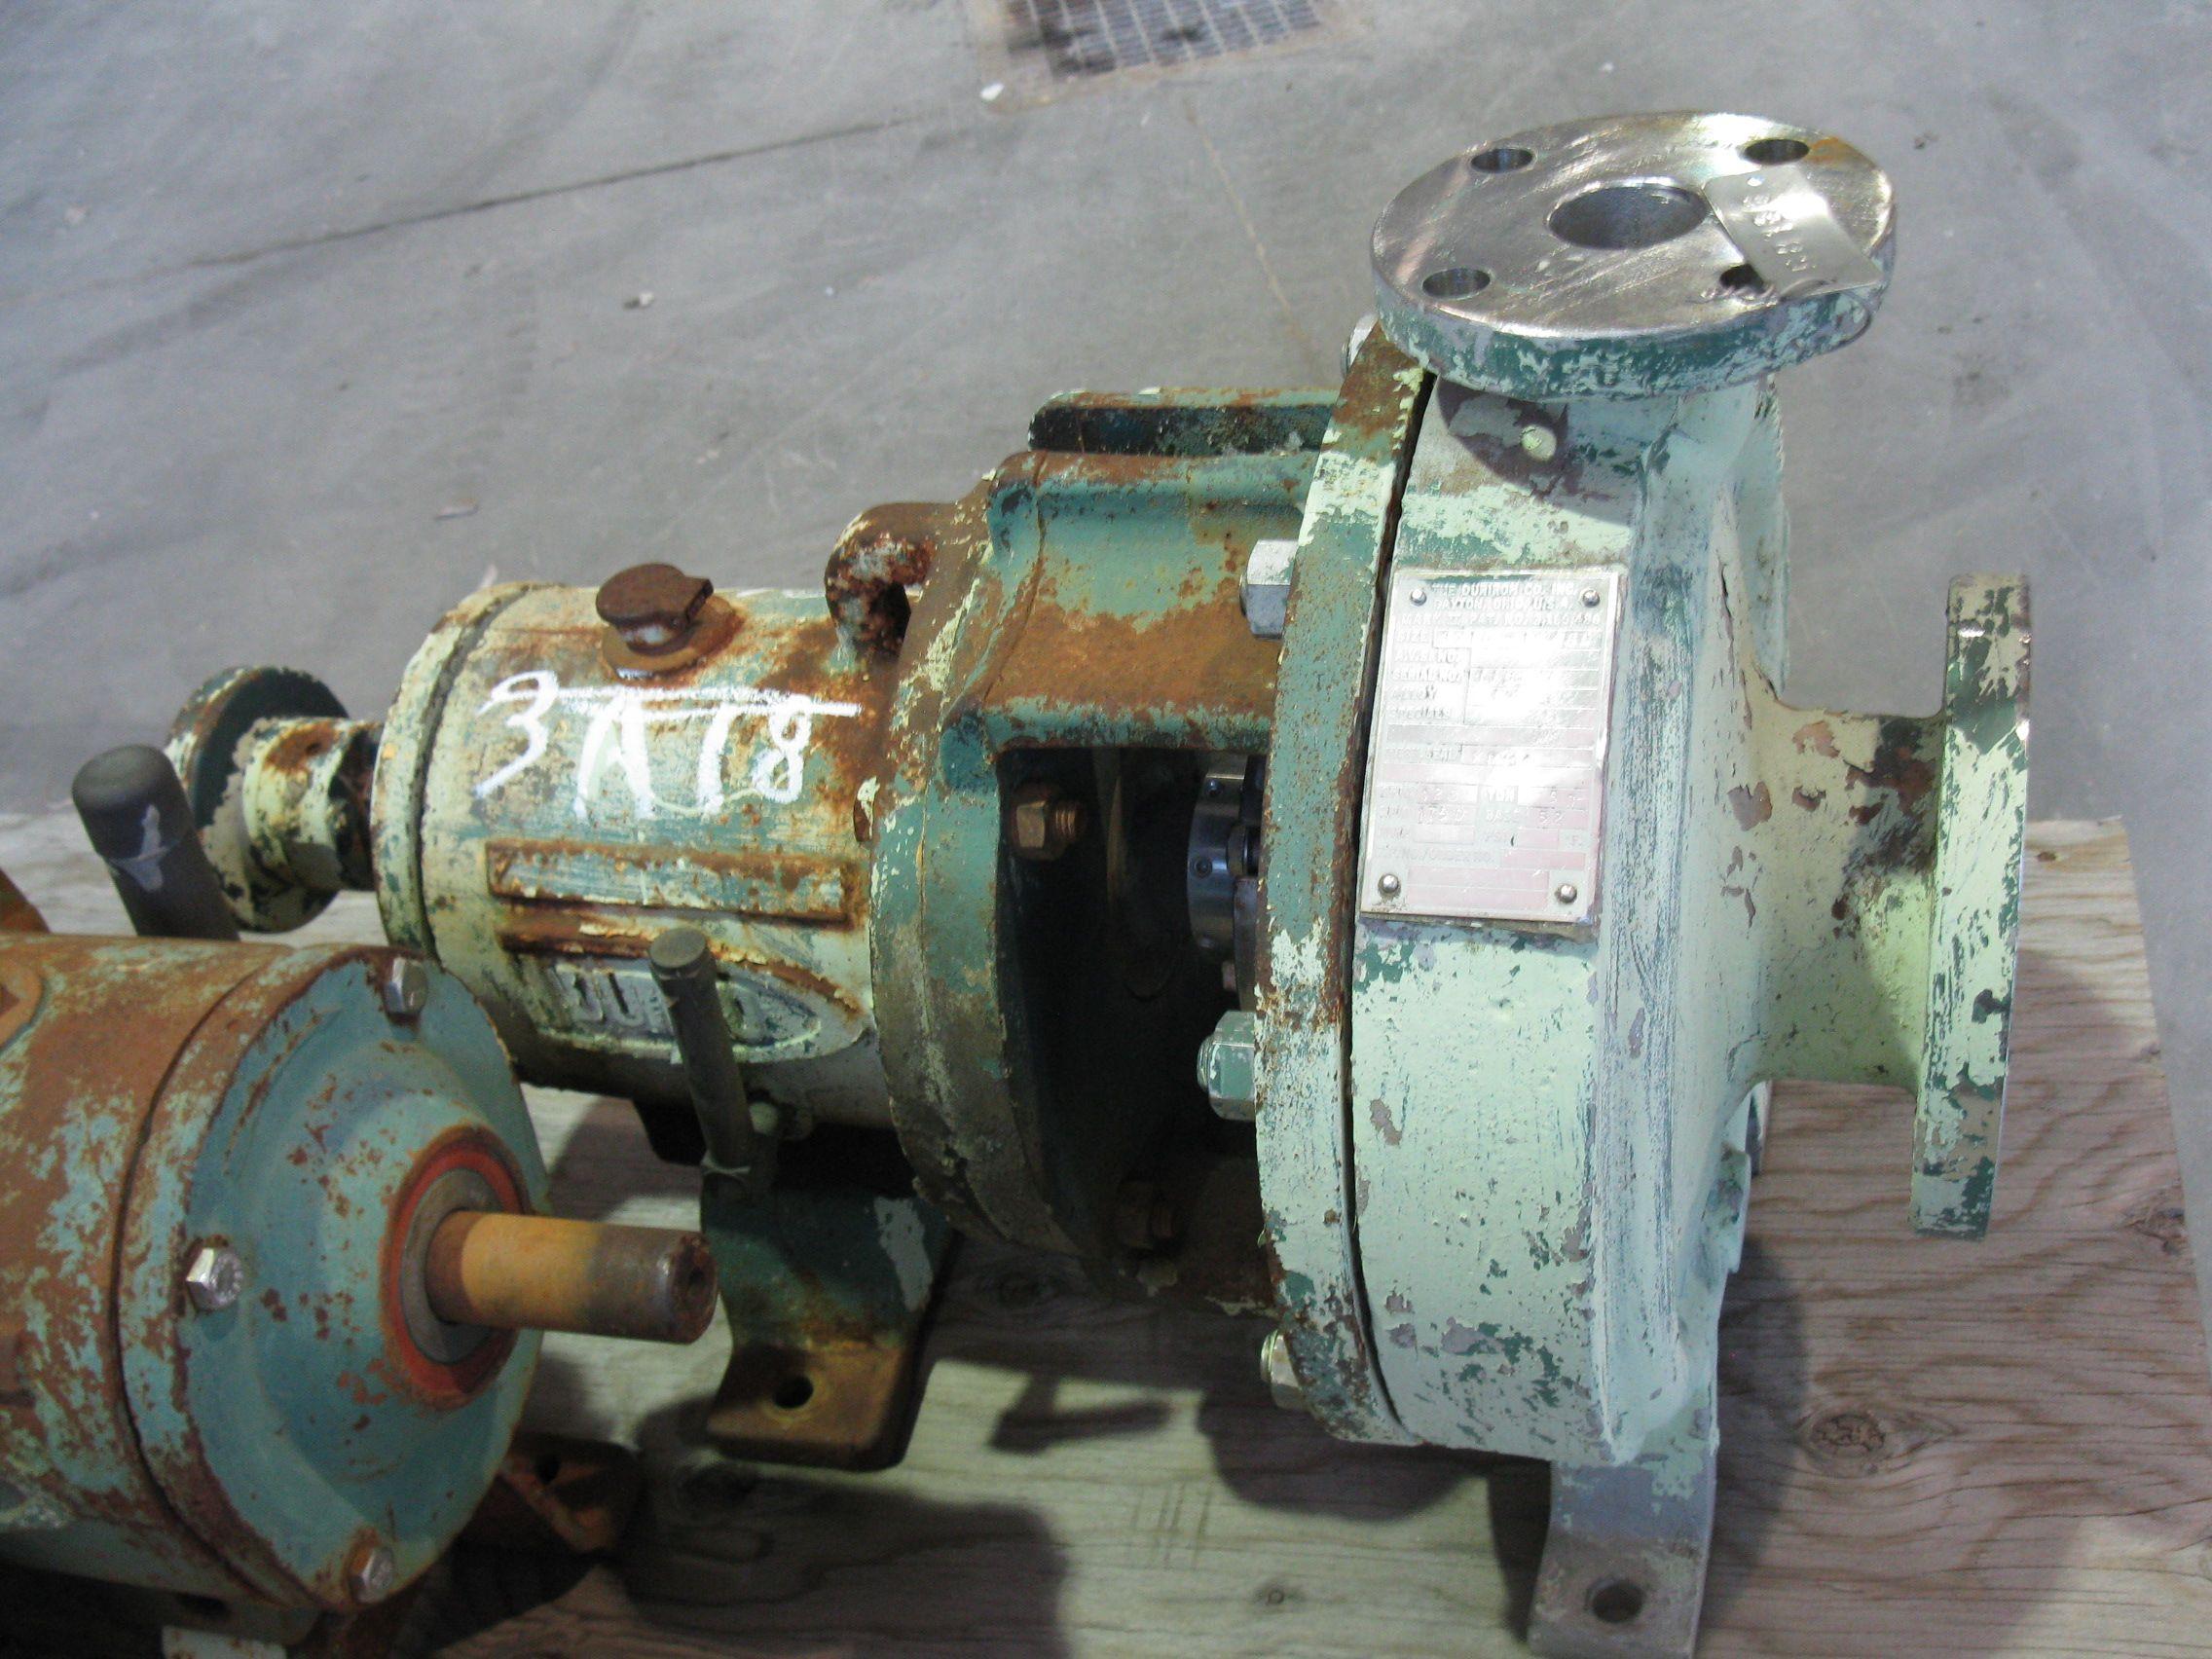 PUMP - DURCO MARK II - 3 X 1 5 - 10